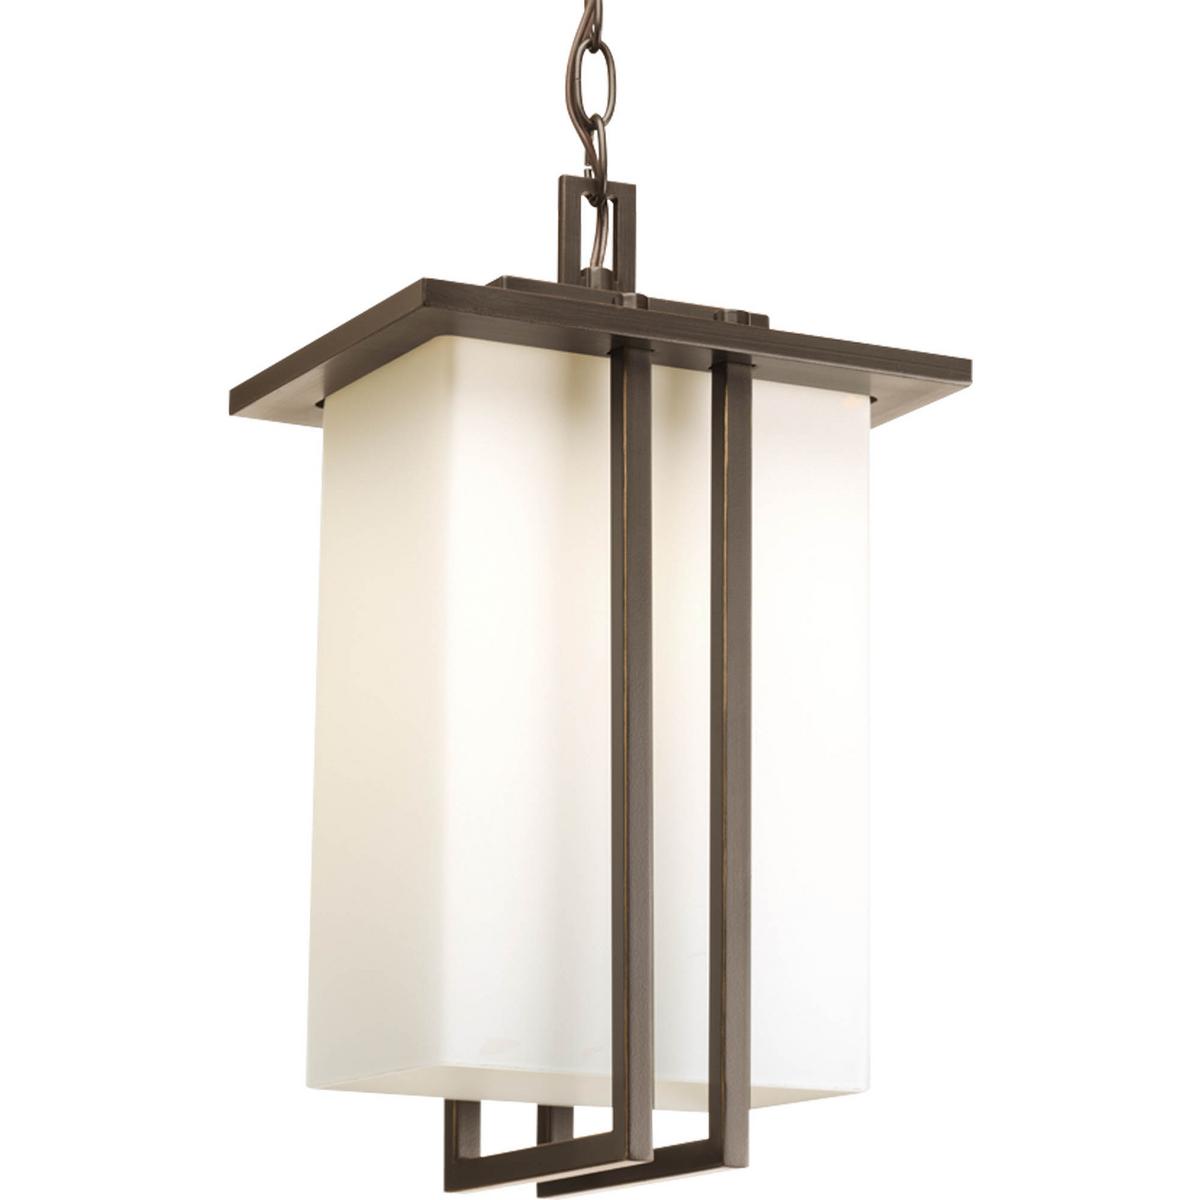 PRO P5590-20 1X100M Antique Bronze Opal Etched Glass Hanging Lantern